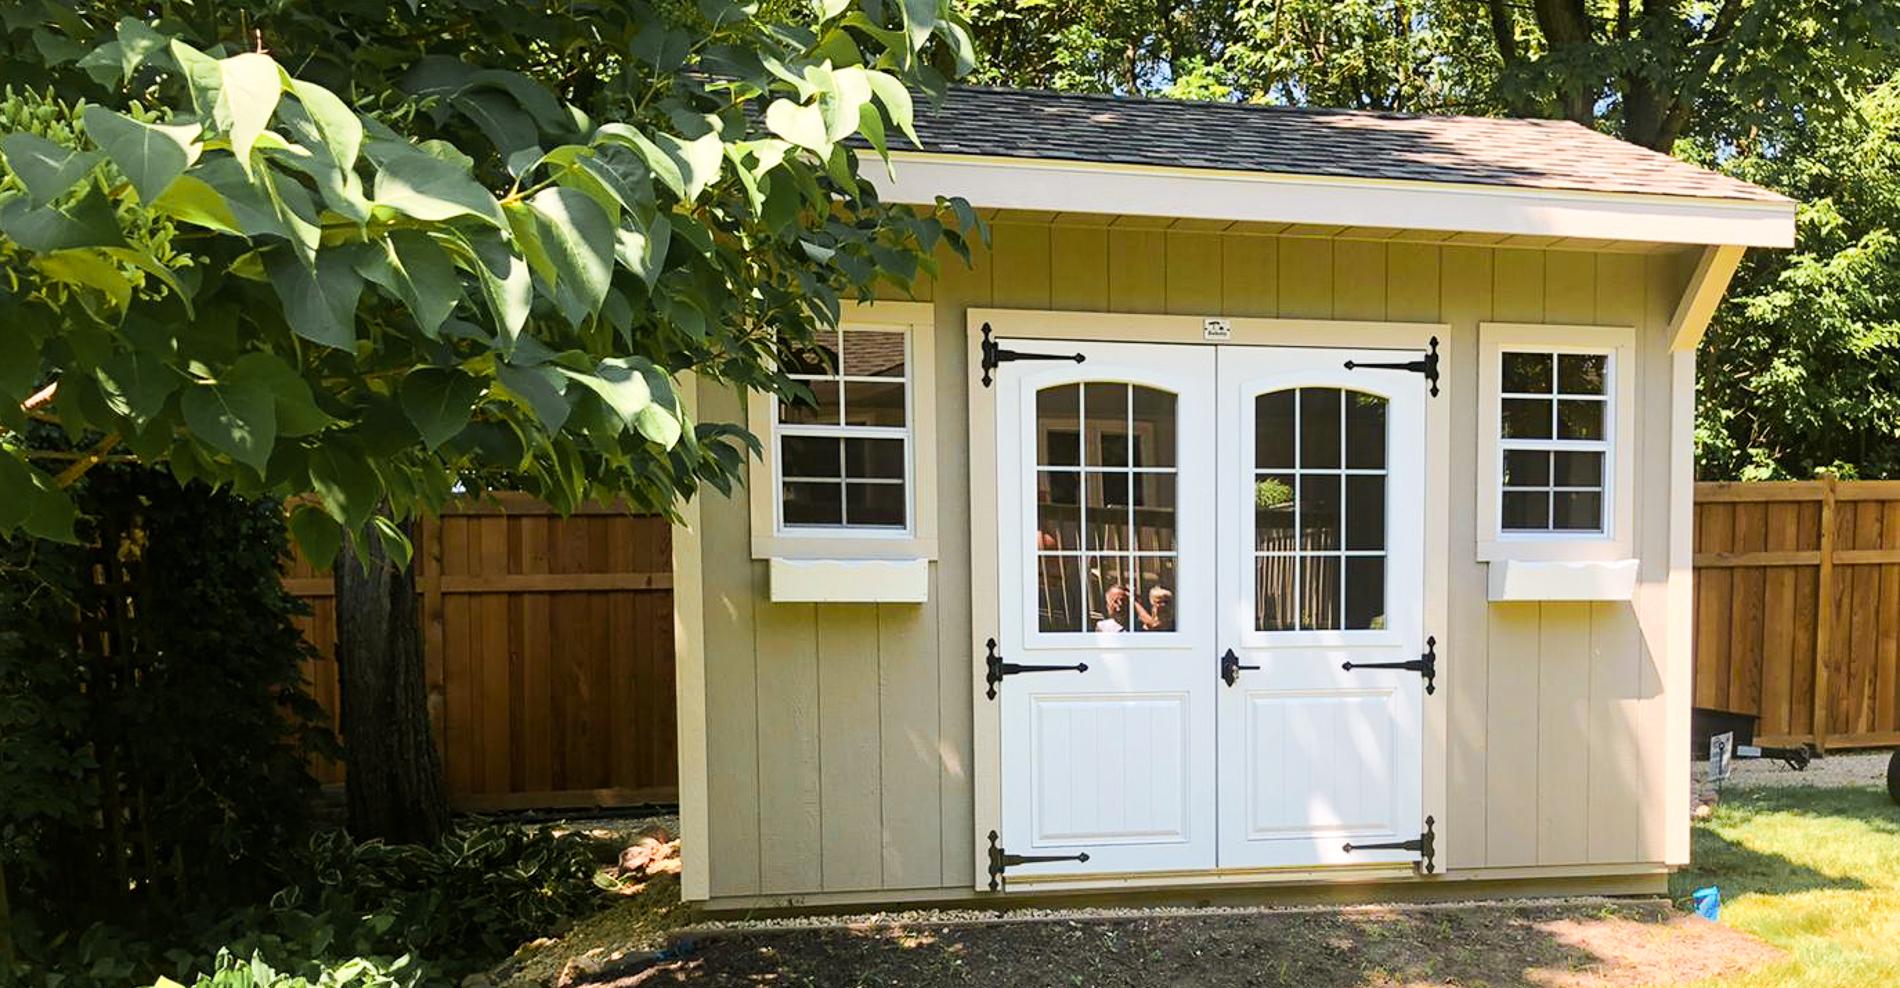 Home studio shed customer usage